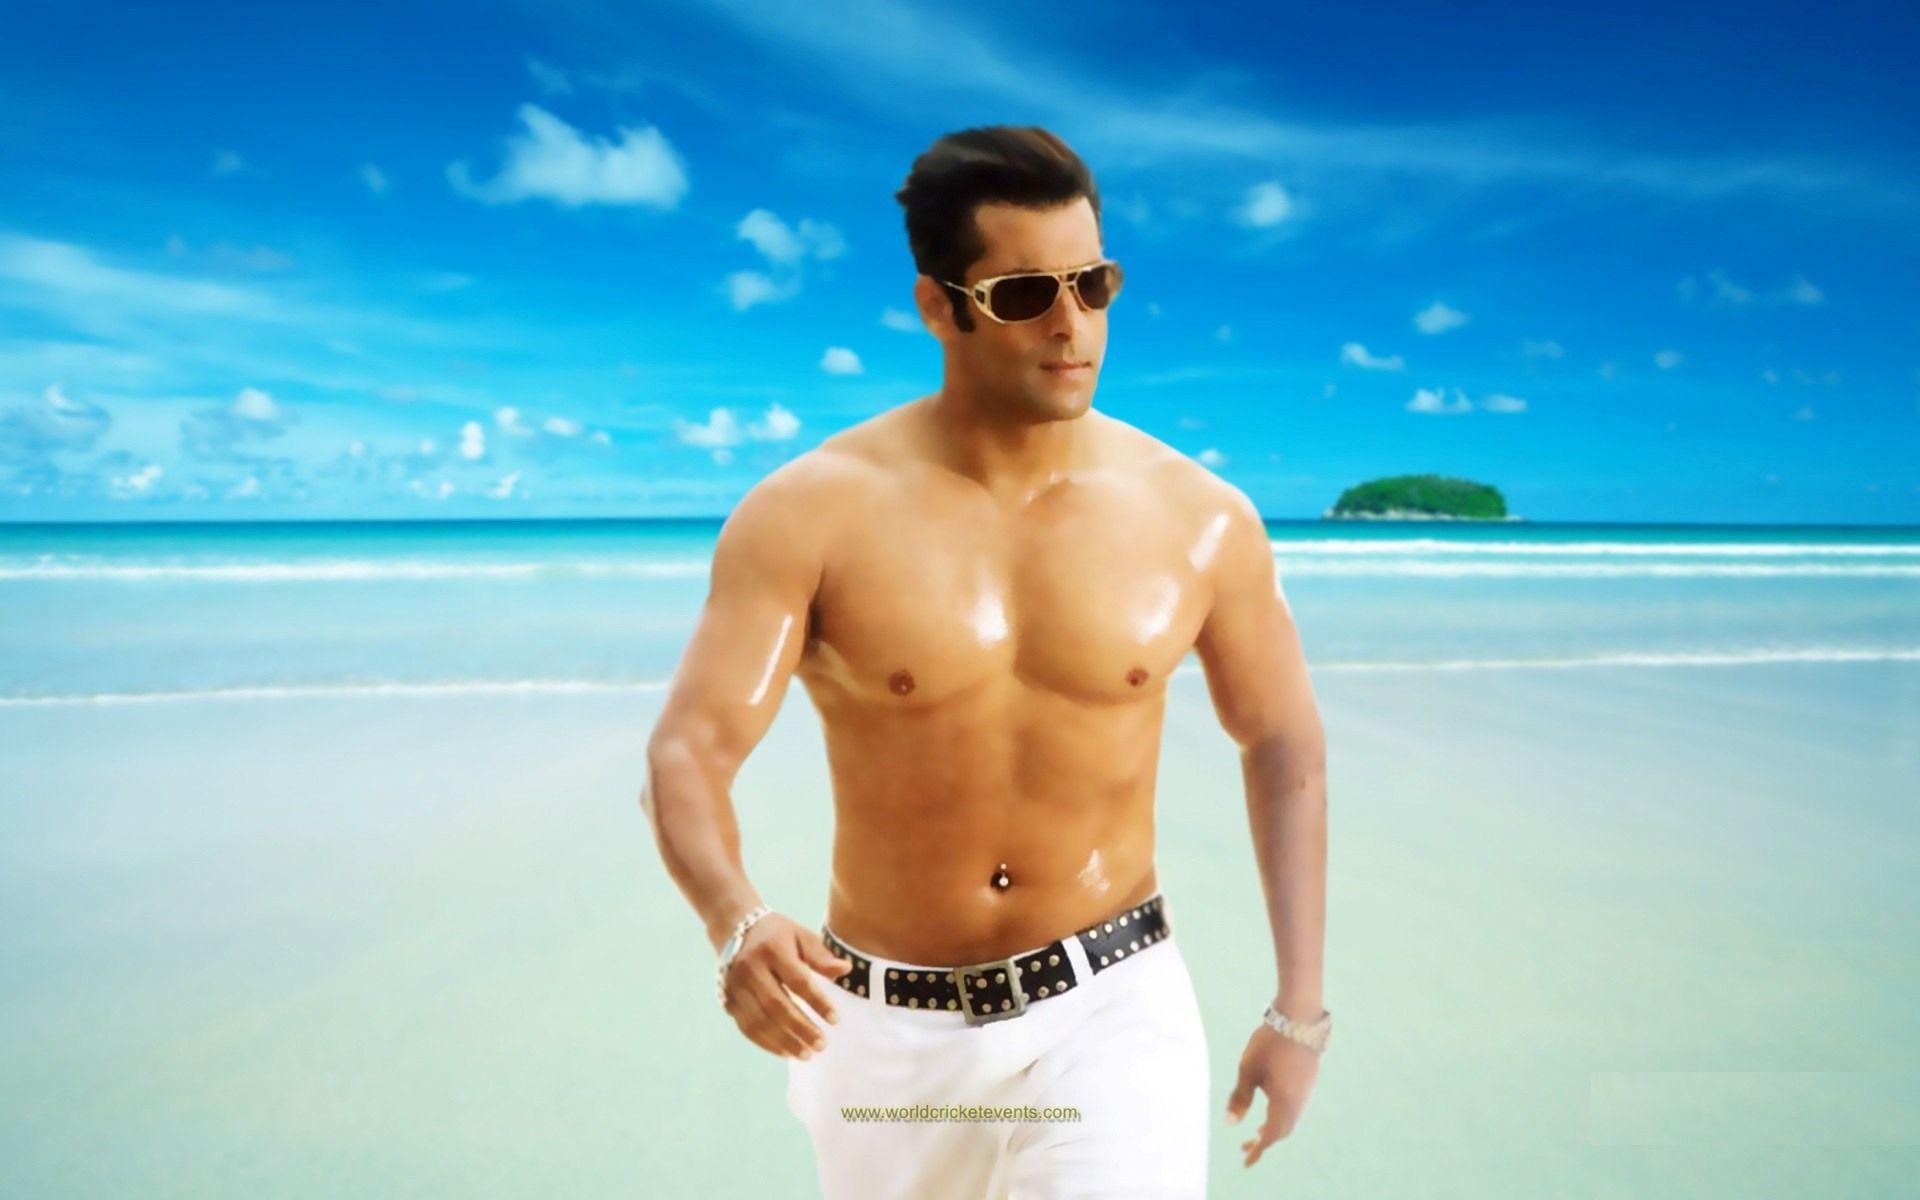 salman khan latest movies hd wallpapers http://worldcricketevents